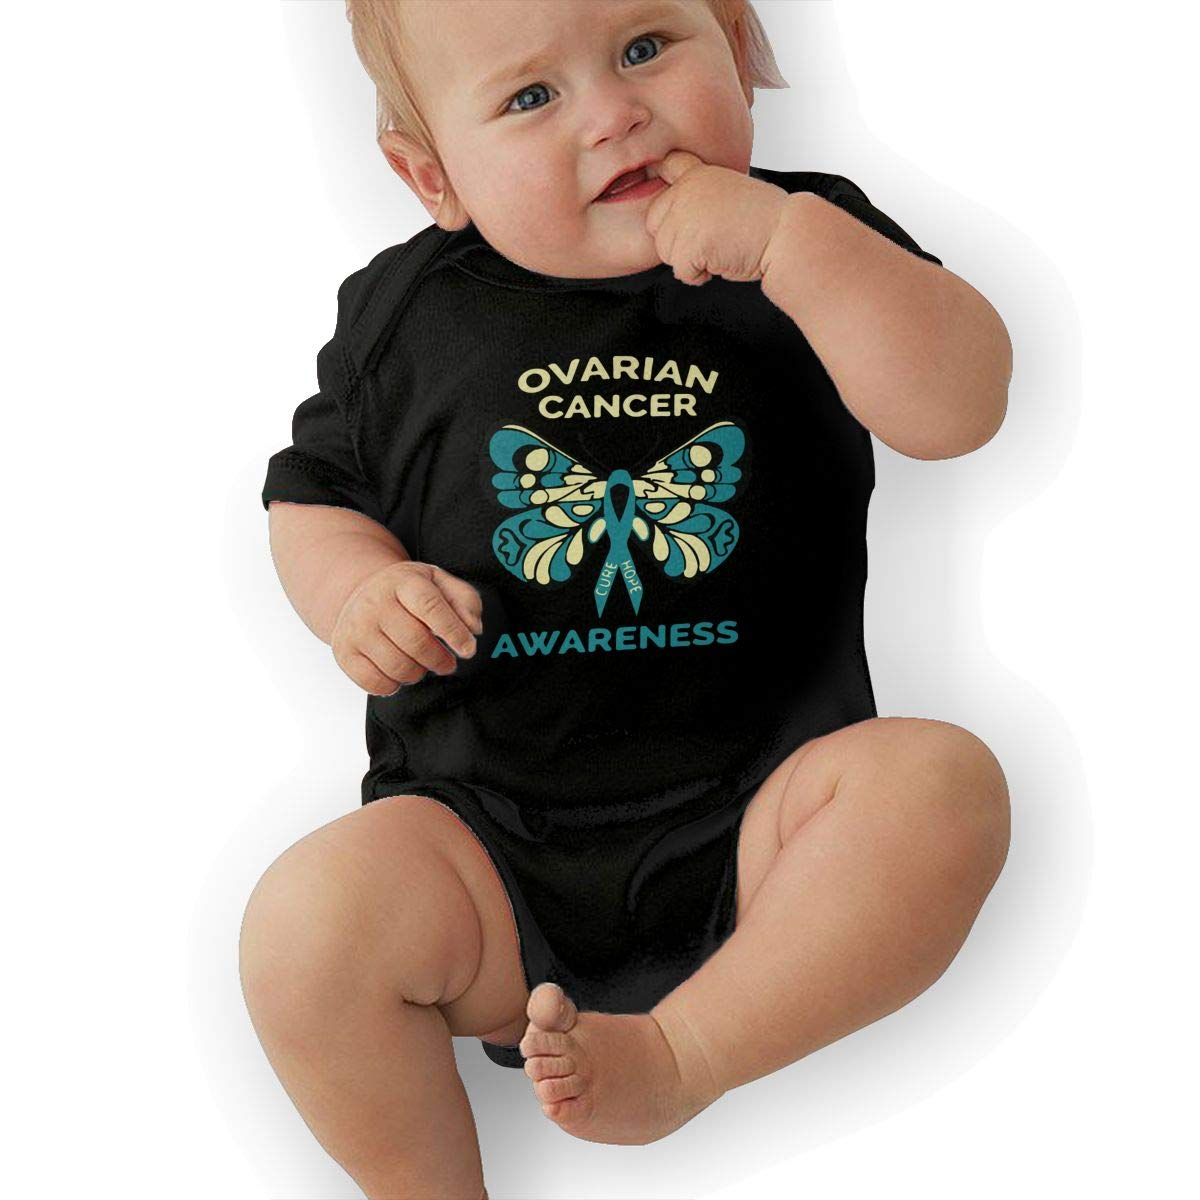 U88oi-8 Short Sleeve Cotton Bodysuit for Unisex Baby Cute Ovarian Cancer Awareness Playsuit